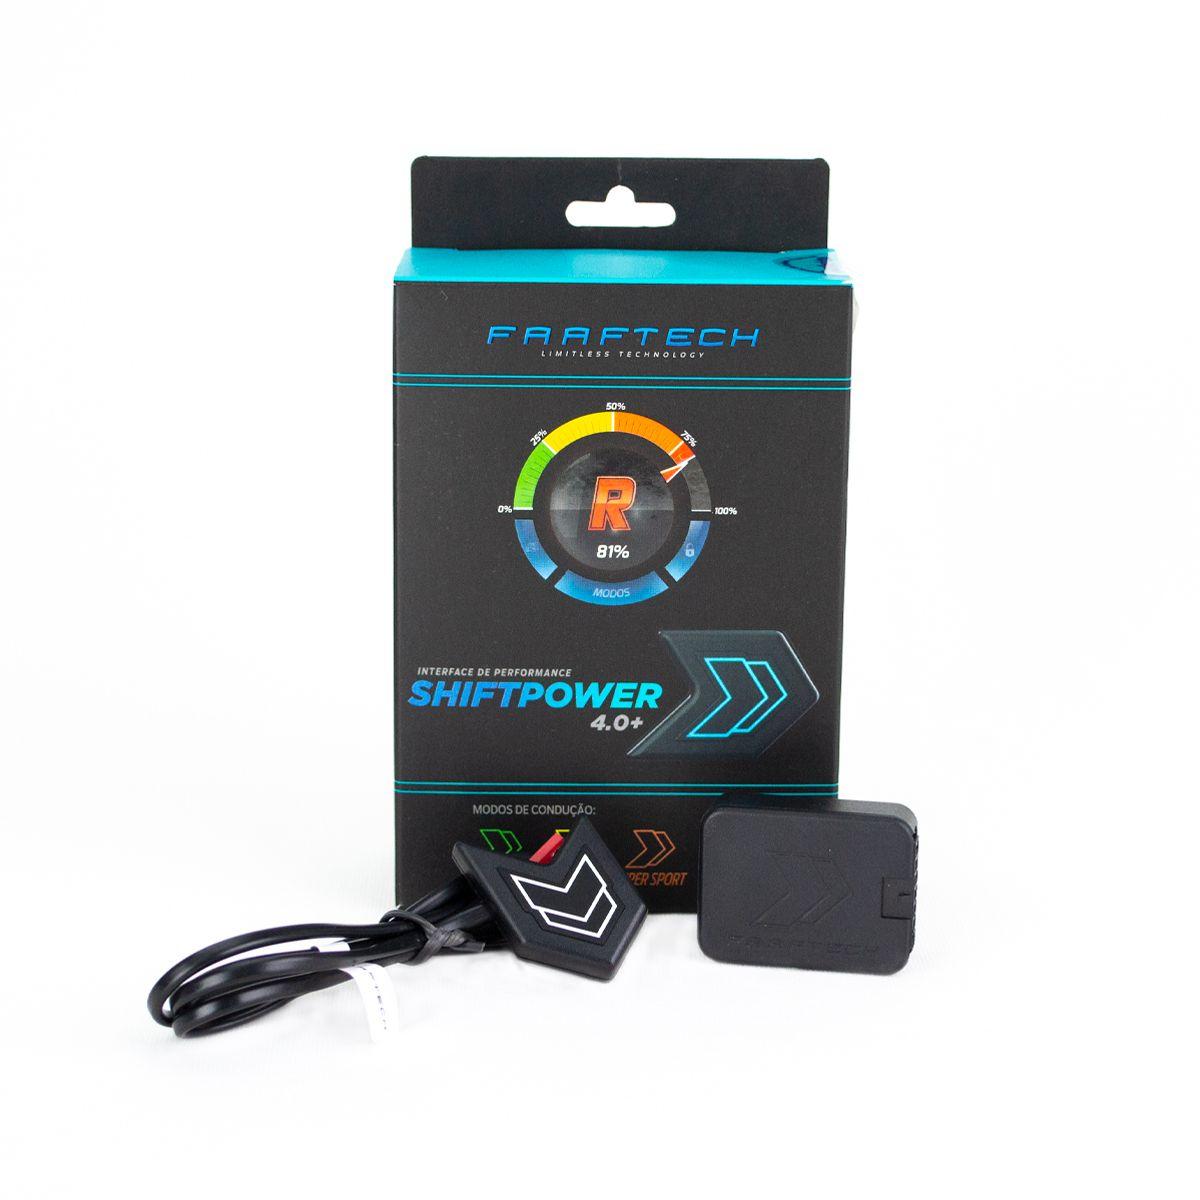 Chip de Pedal Shiftpower Para Citroen Aircross